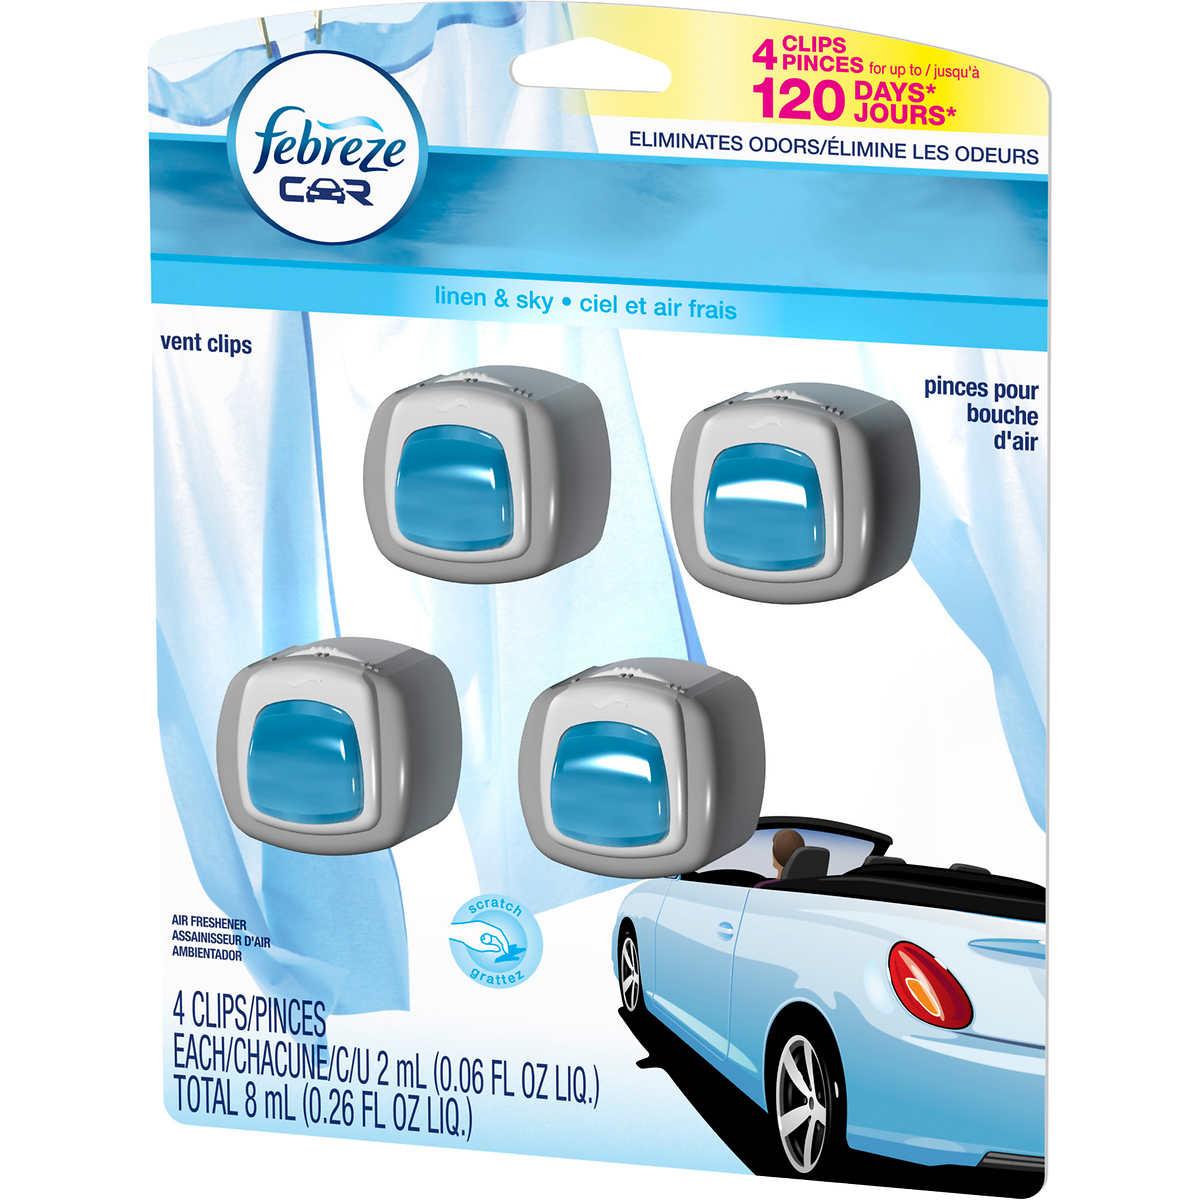 Weathertech mats costco - Febreze Car Vent Clips Linen Sky Scent 3 Pack